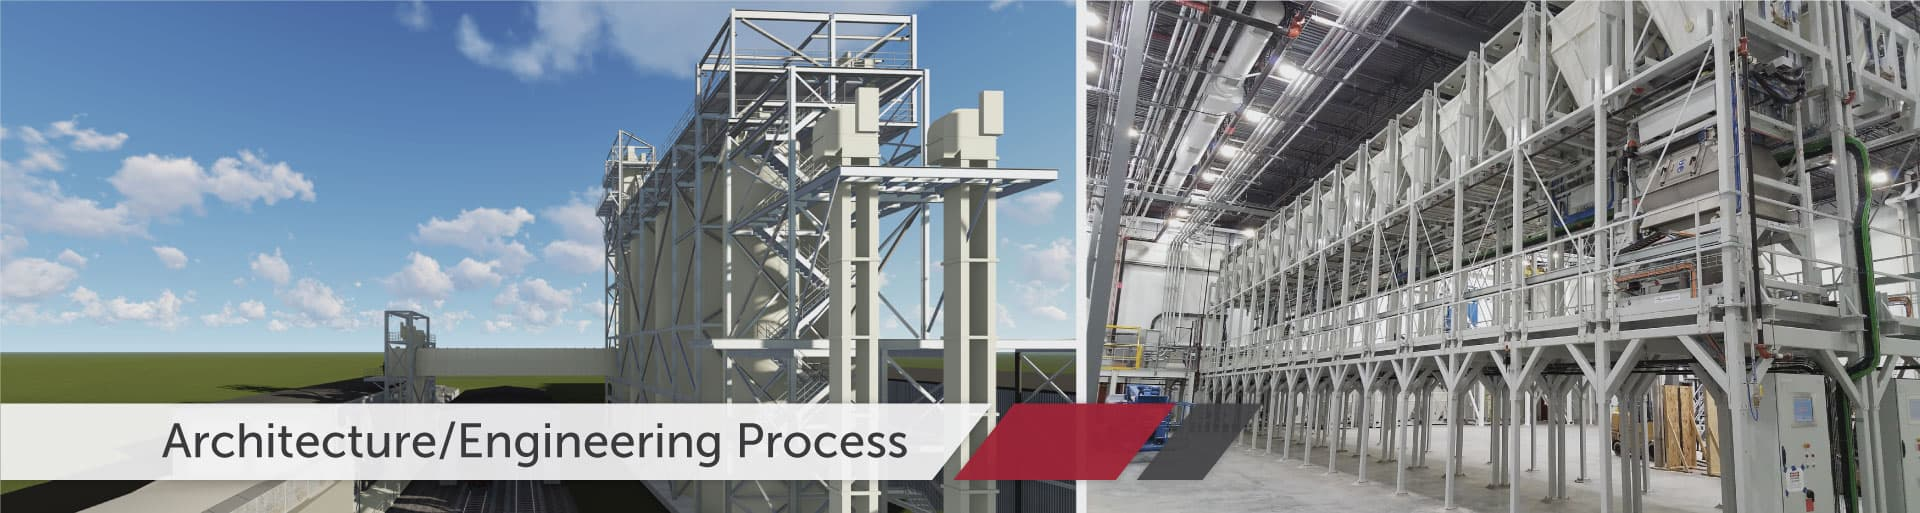 2019 AE-Process Header